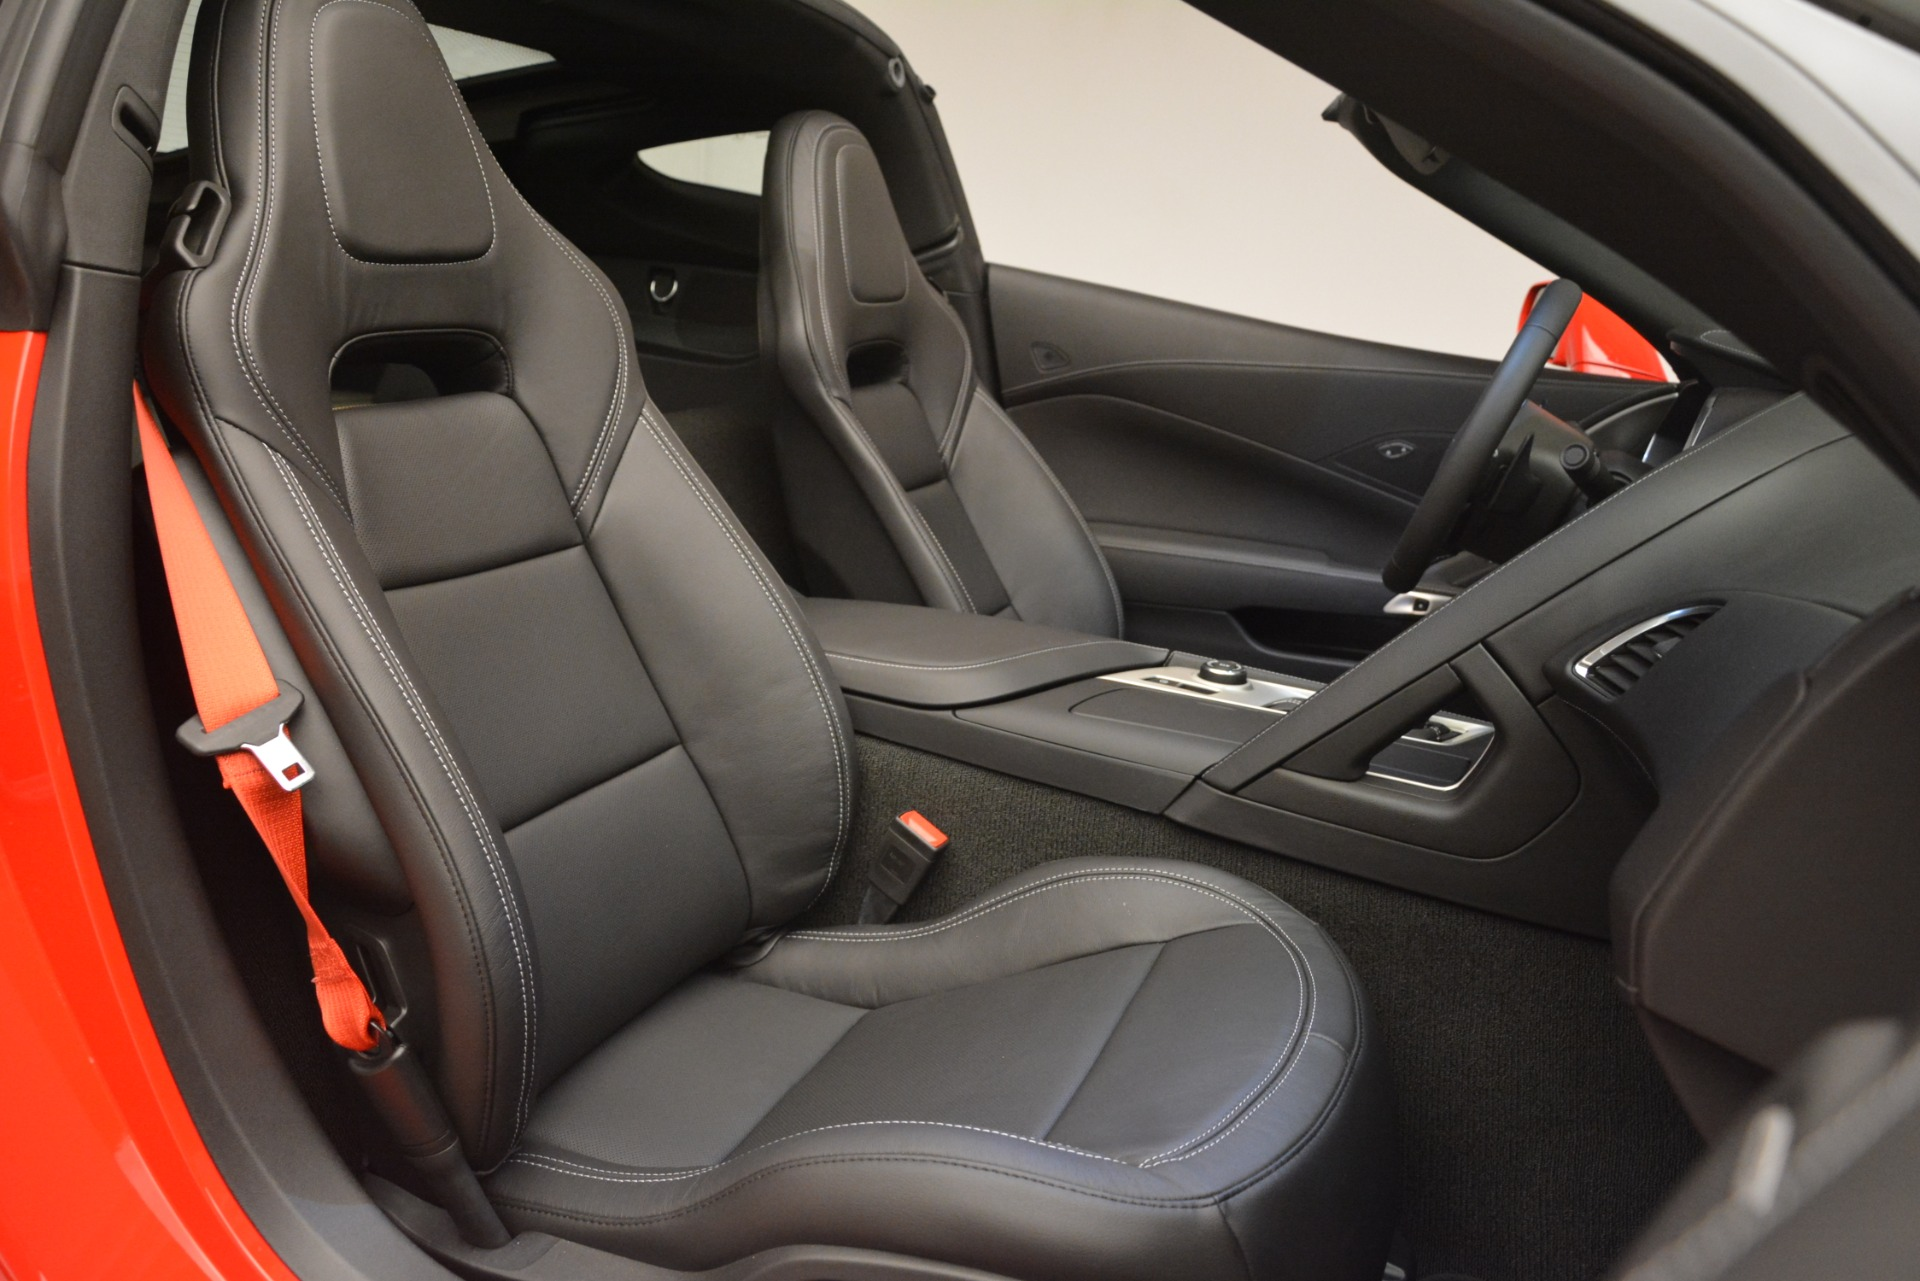 Used 2019 Chevrolet Corvette Grand Sport For Sale In Greenwich, CT 3169_p25